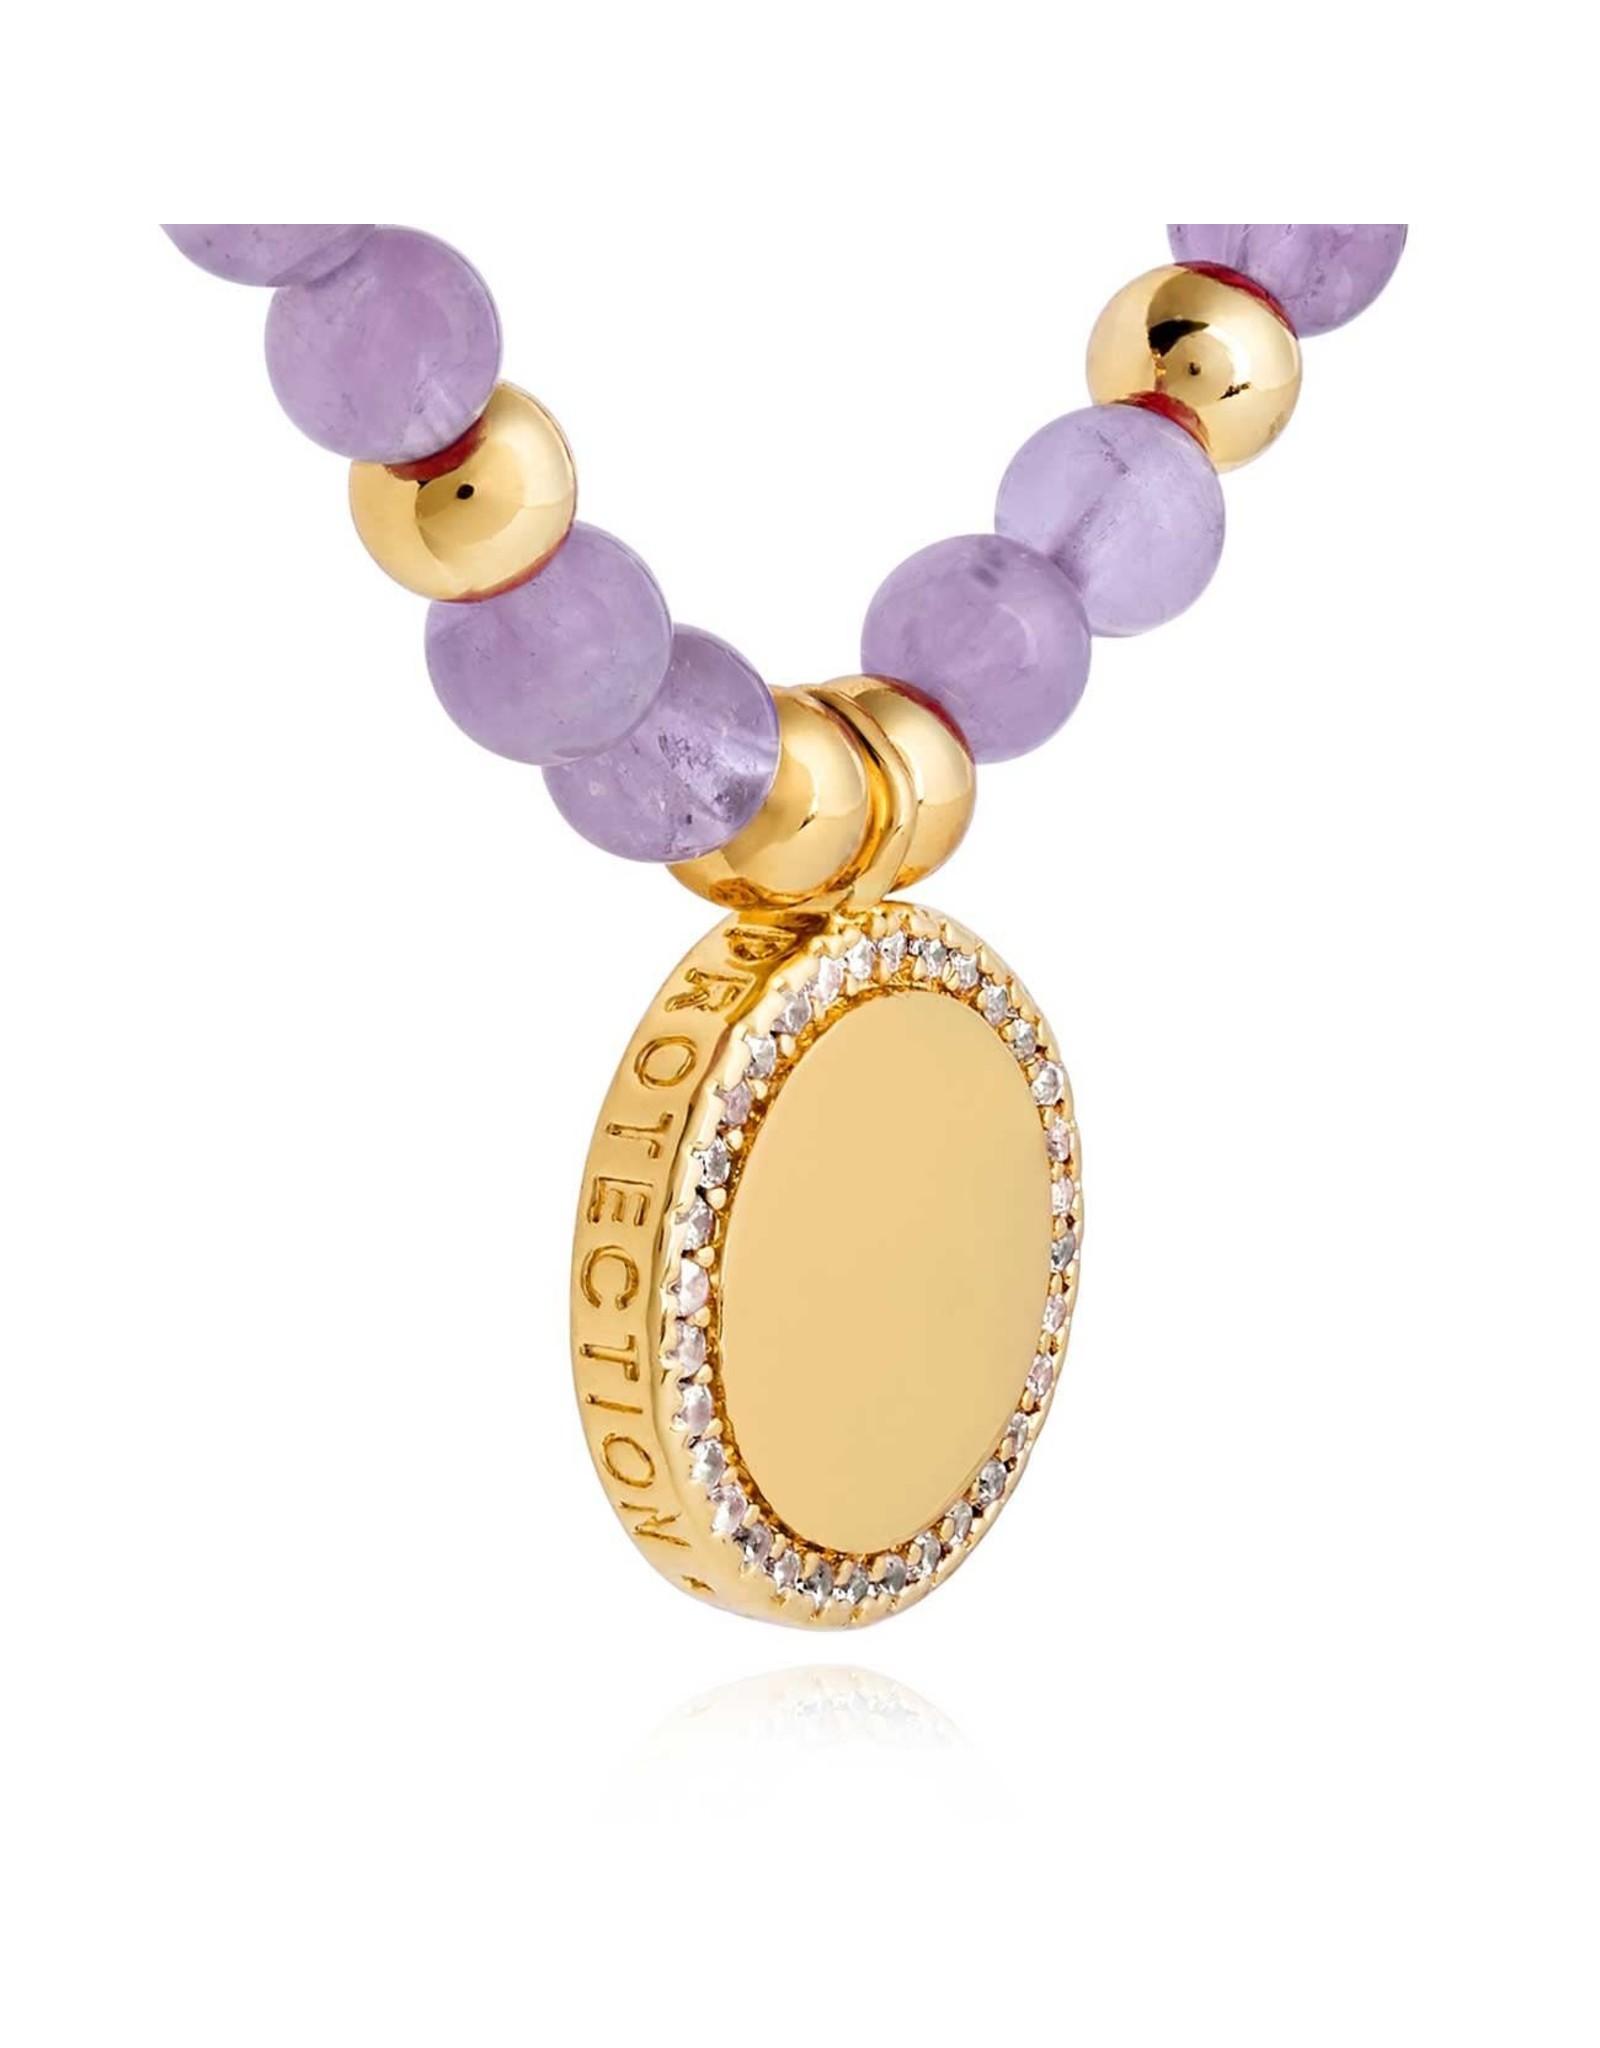 Joma Jewellery Wellness Gems - Amethyst  - Armband